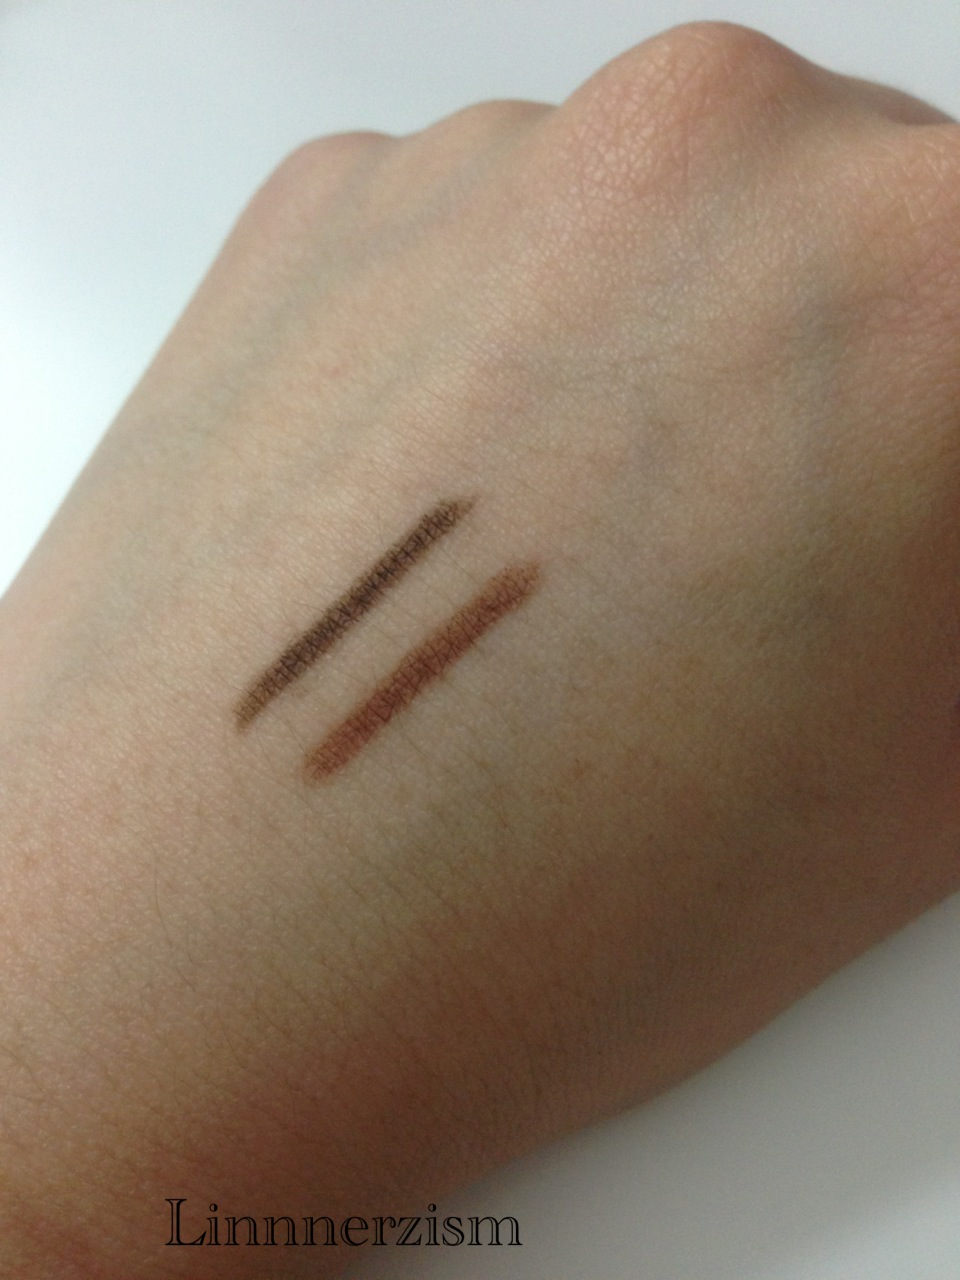 Linnnerzism Maybelline Define A Brow Eyebrow Pencil